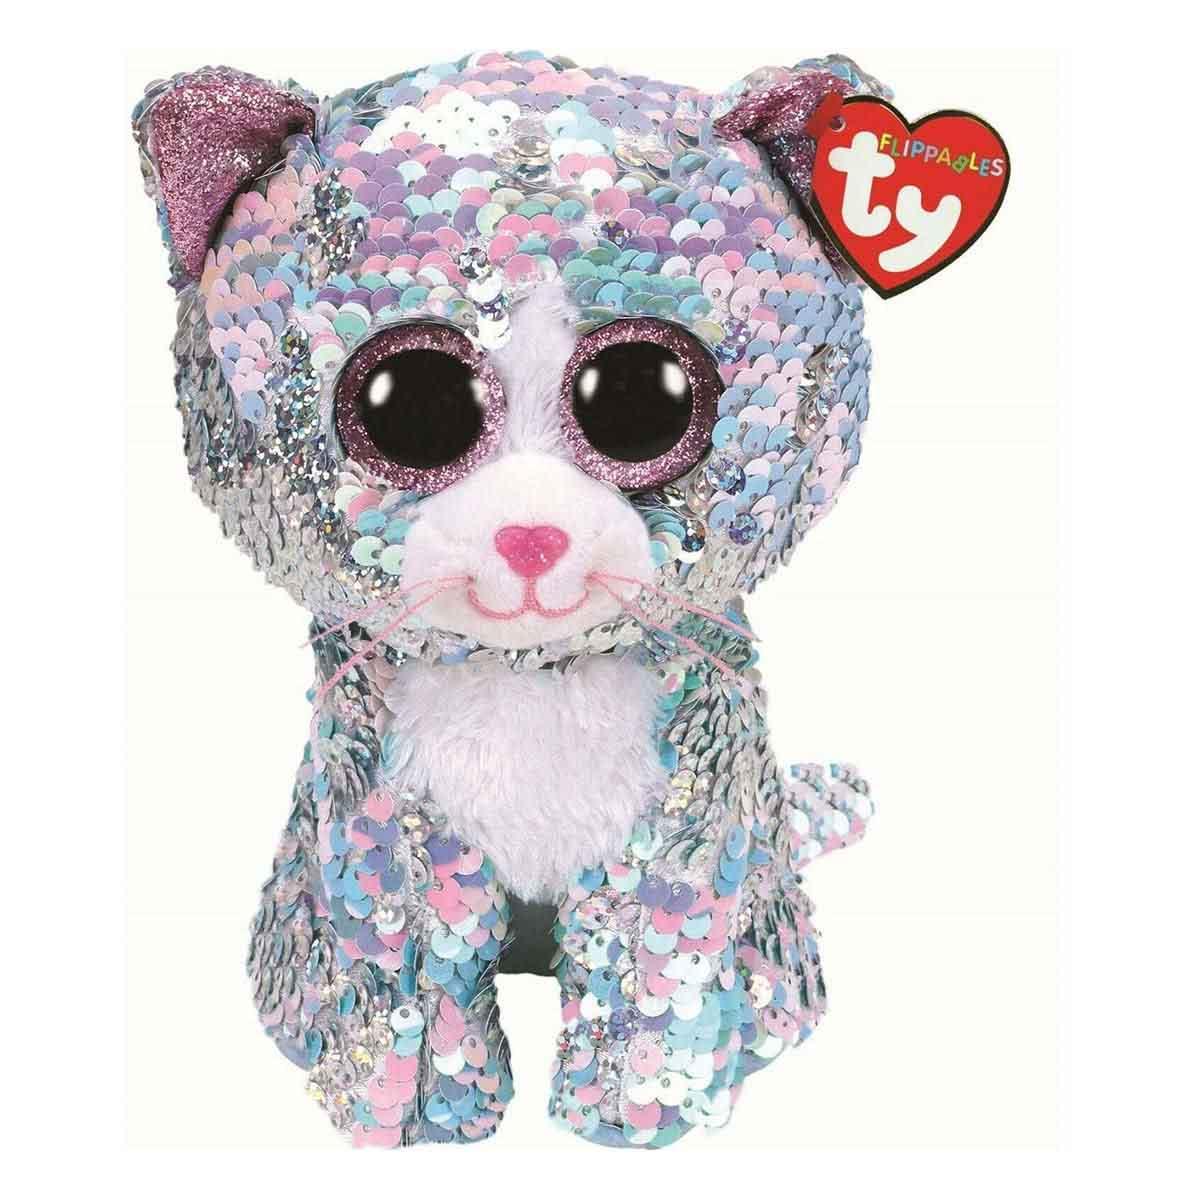 36674 TY Flippables WHIMSY - голубая кошка в пайетках 15 см